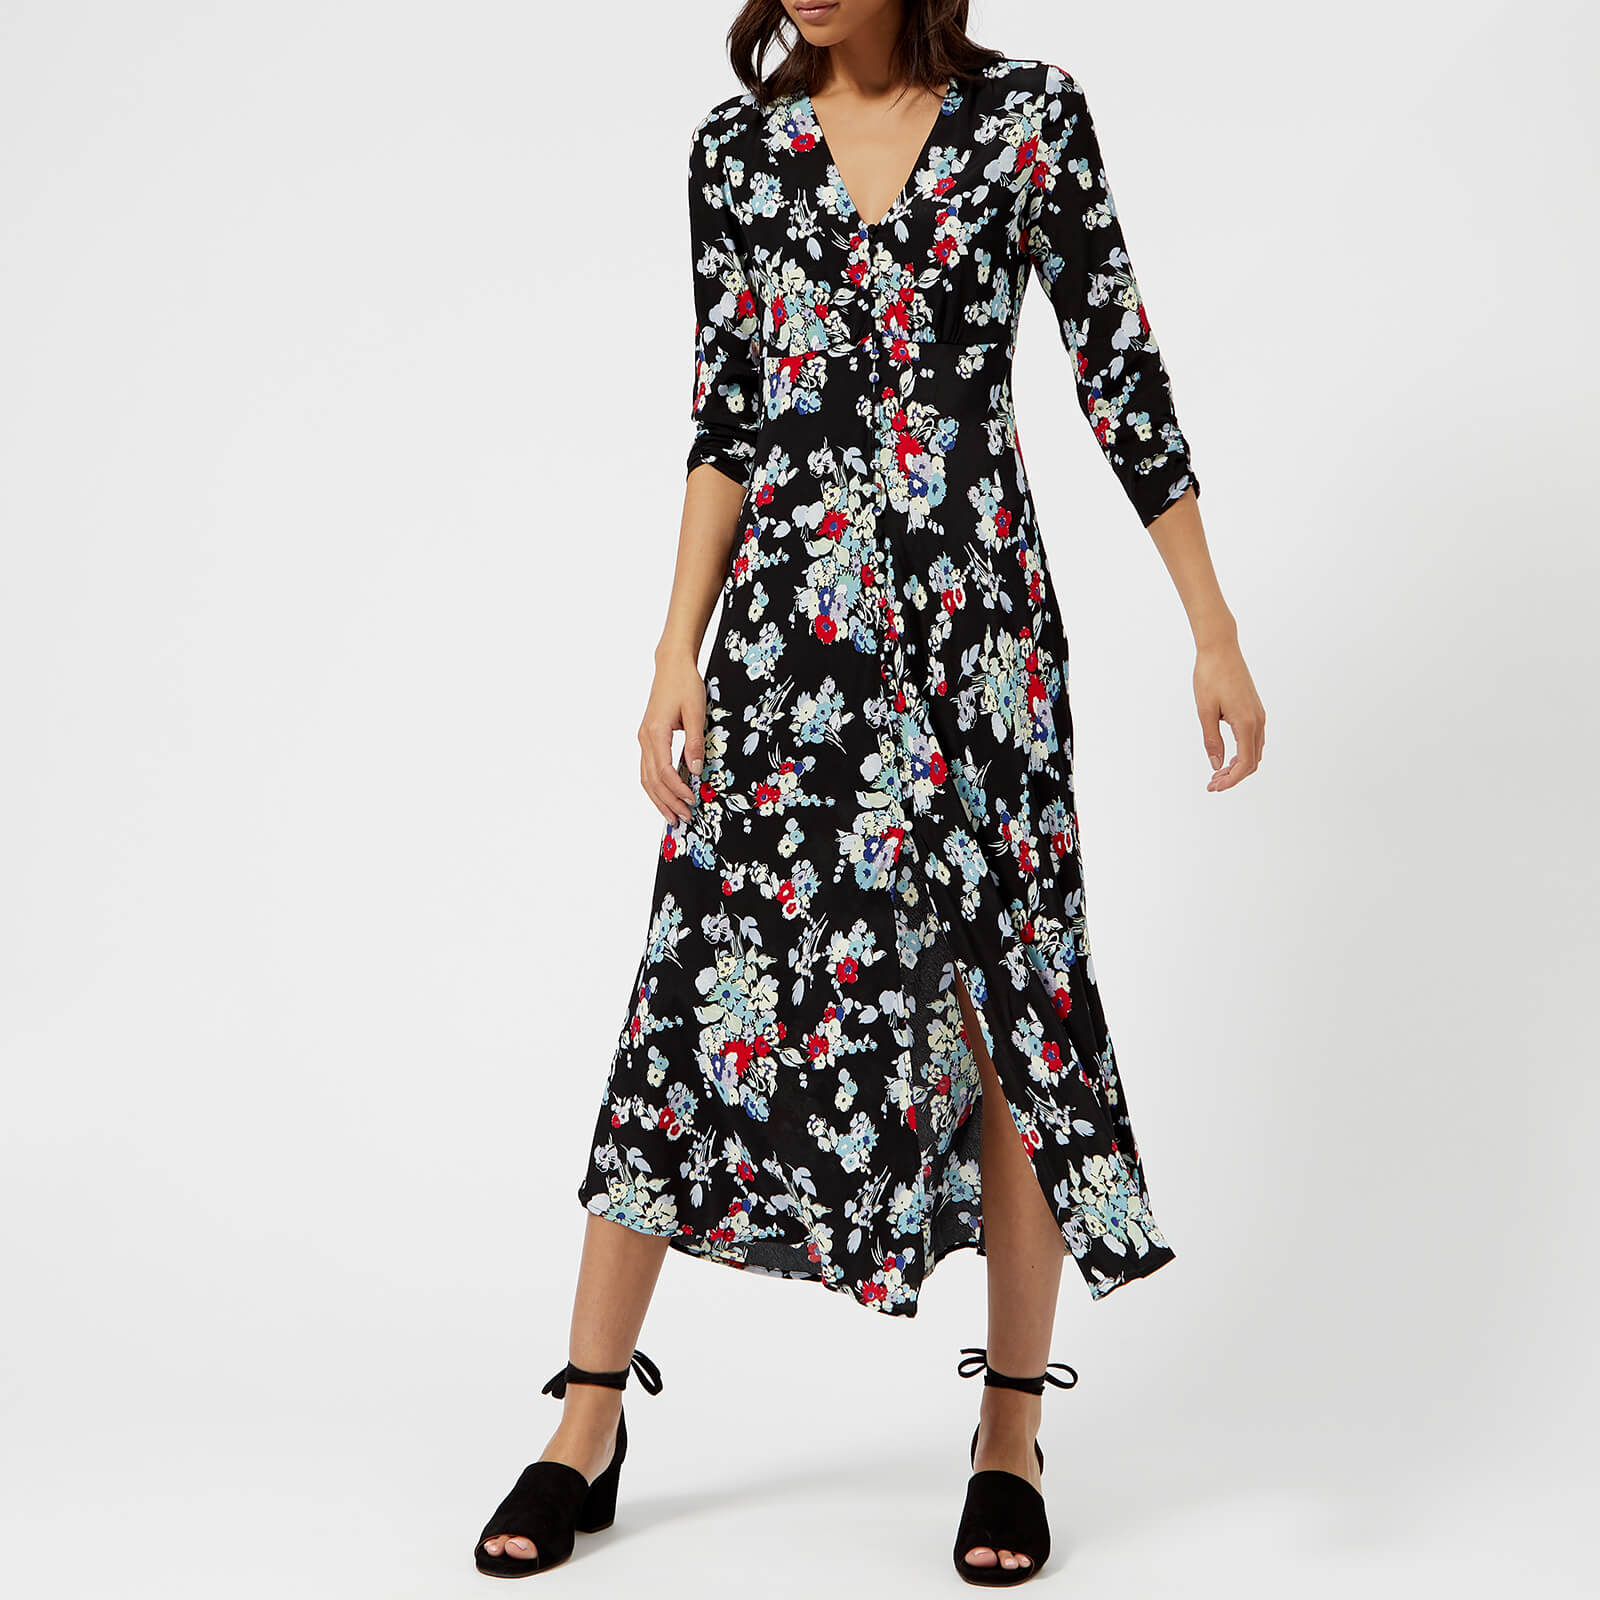 159101ed32545 RIXO Women's Katie Button Down Maxi Dress - Pastel 30S Bunch Floral